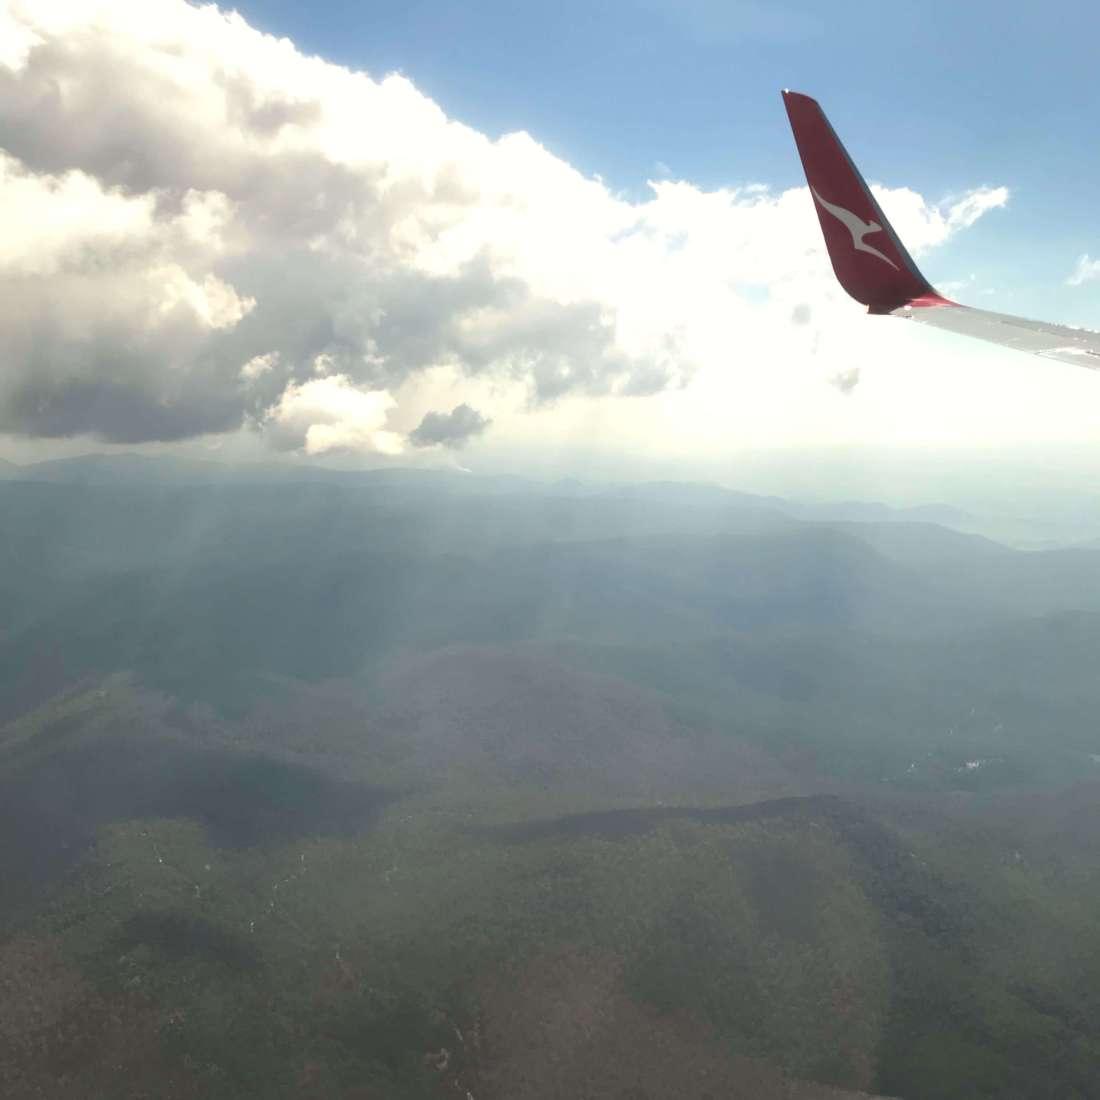 Somewhere above Canberra, Australia